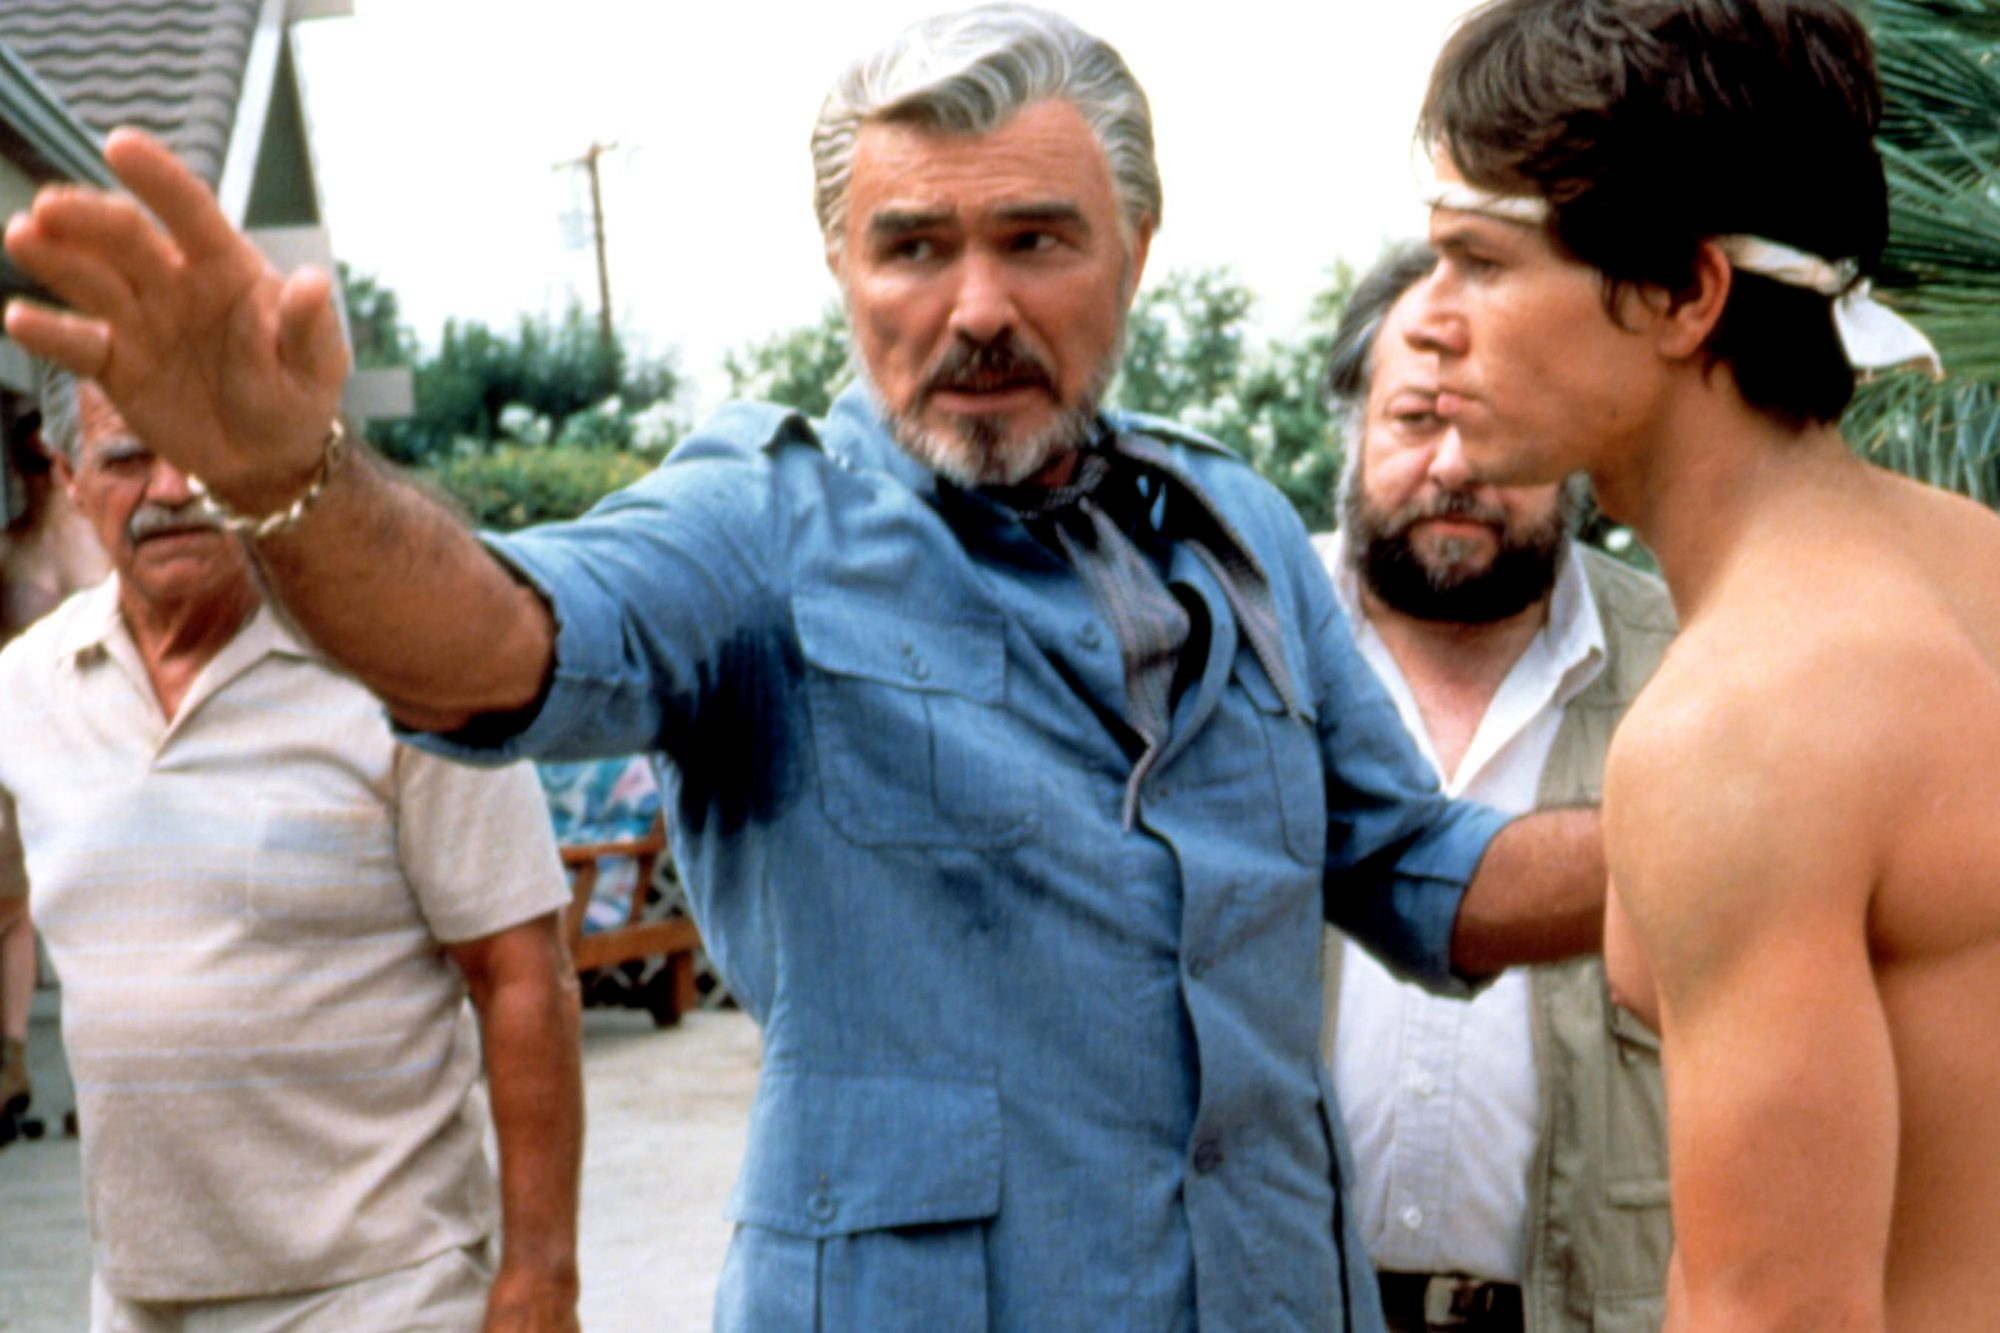 BOOGIE NIGHTS, Burt Reynolds, Mark Wahlberg, 1997